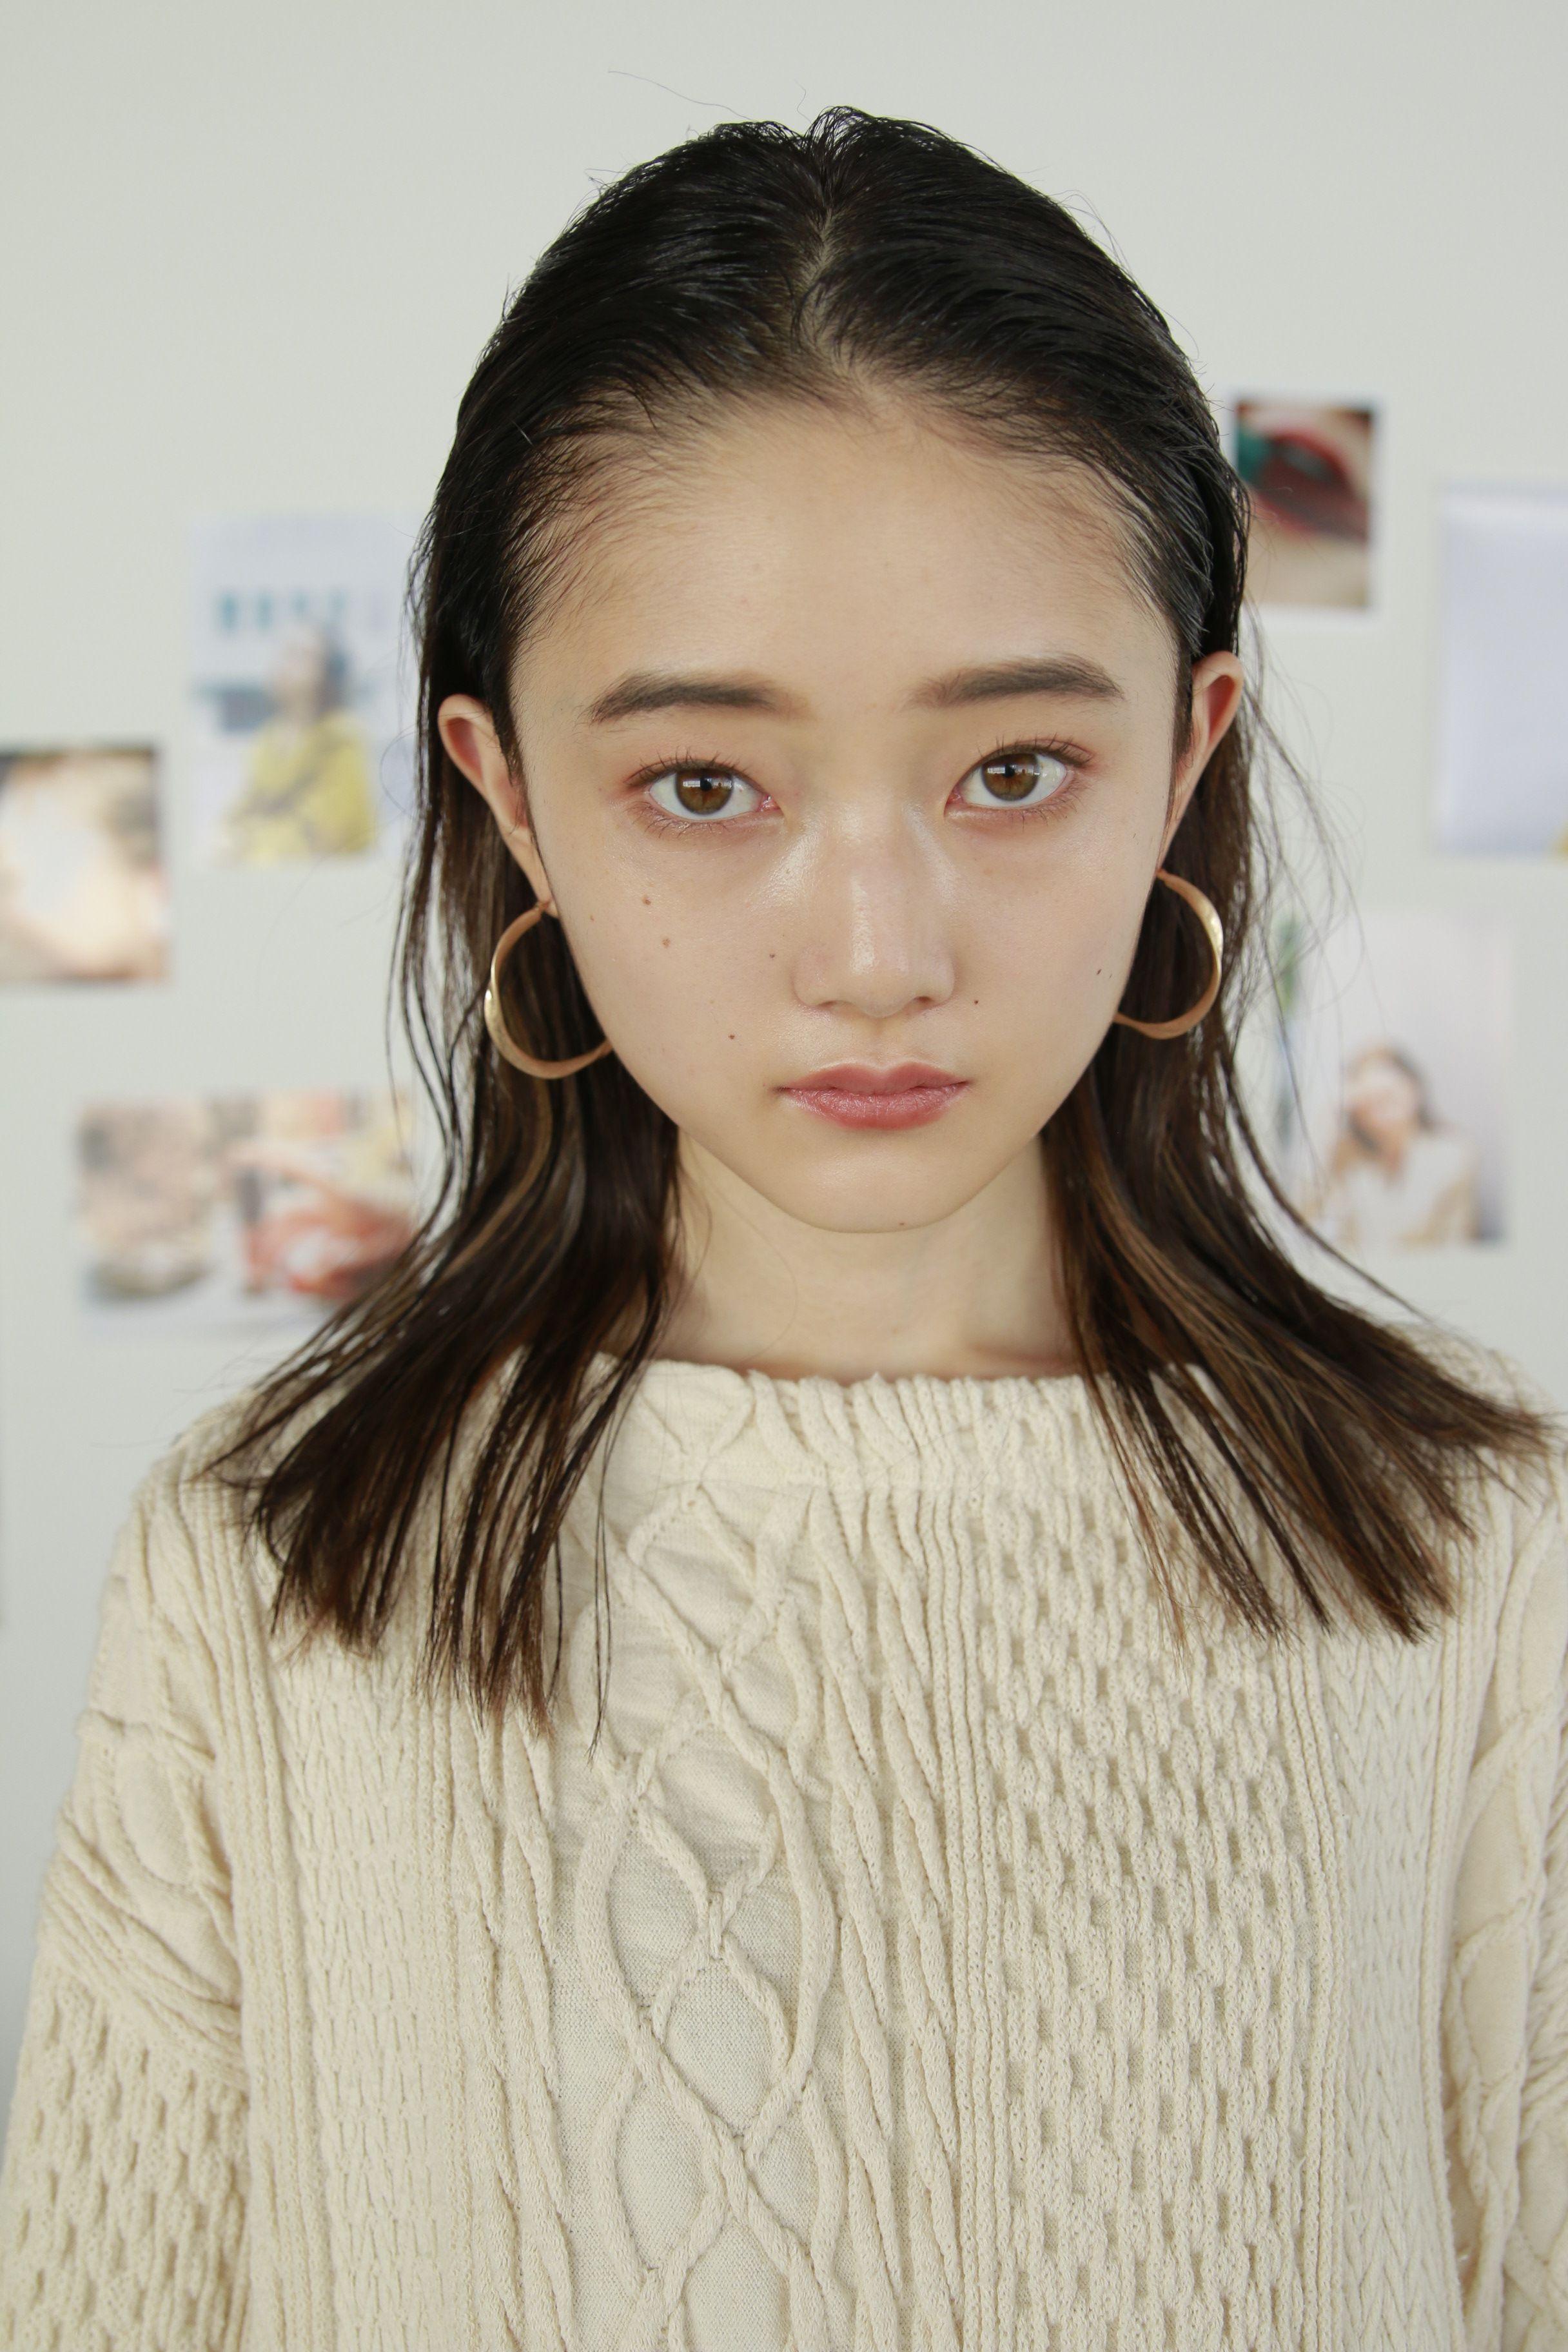 Shinobu Takahashiさん Nanuk Takahashi Buri Instagram写真と動画 Hair Photo Hair Makeup Hairstyle